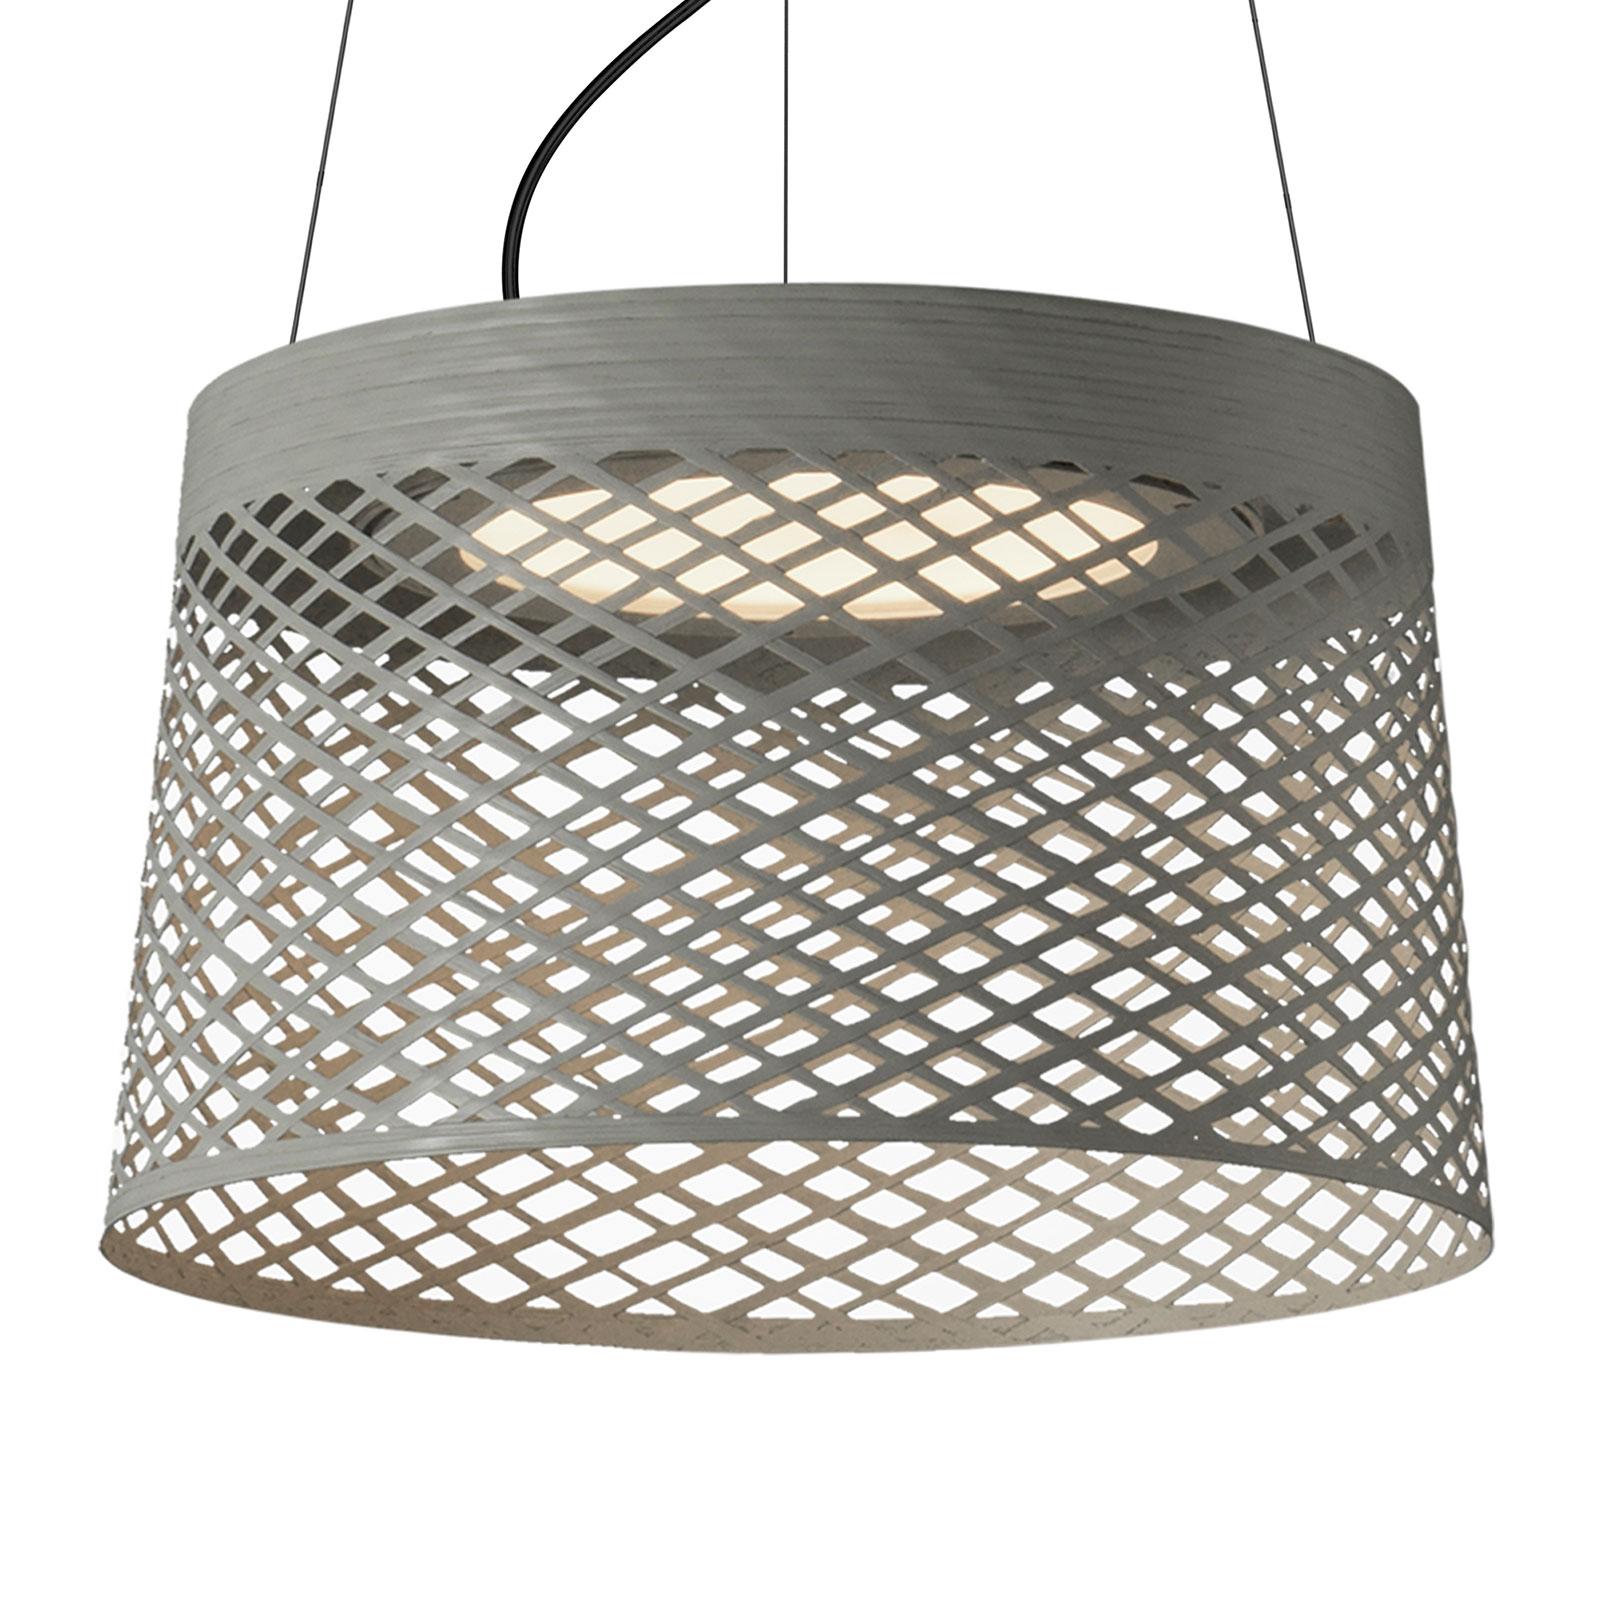 Foscarini Twiggy Grid LED-pendellampe, greige